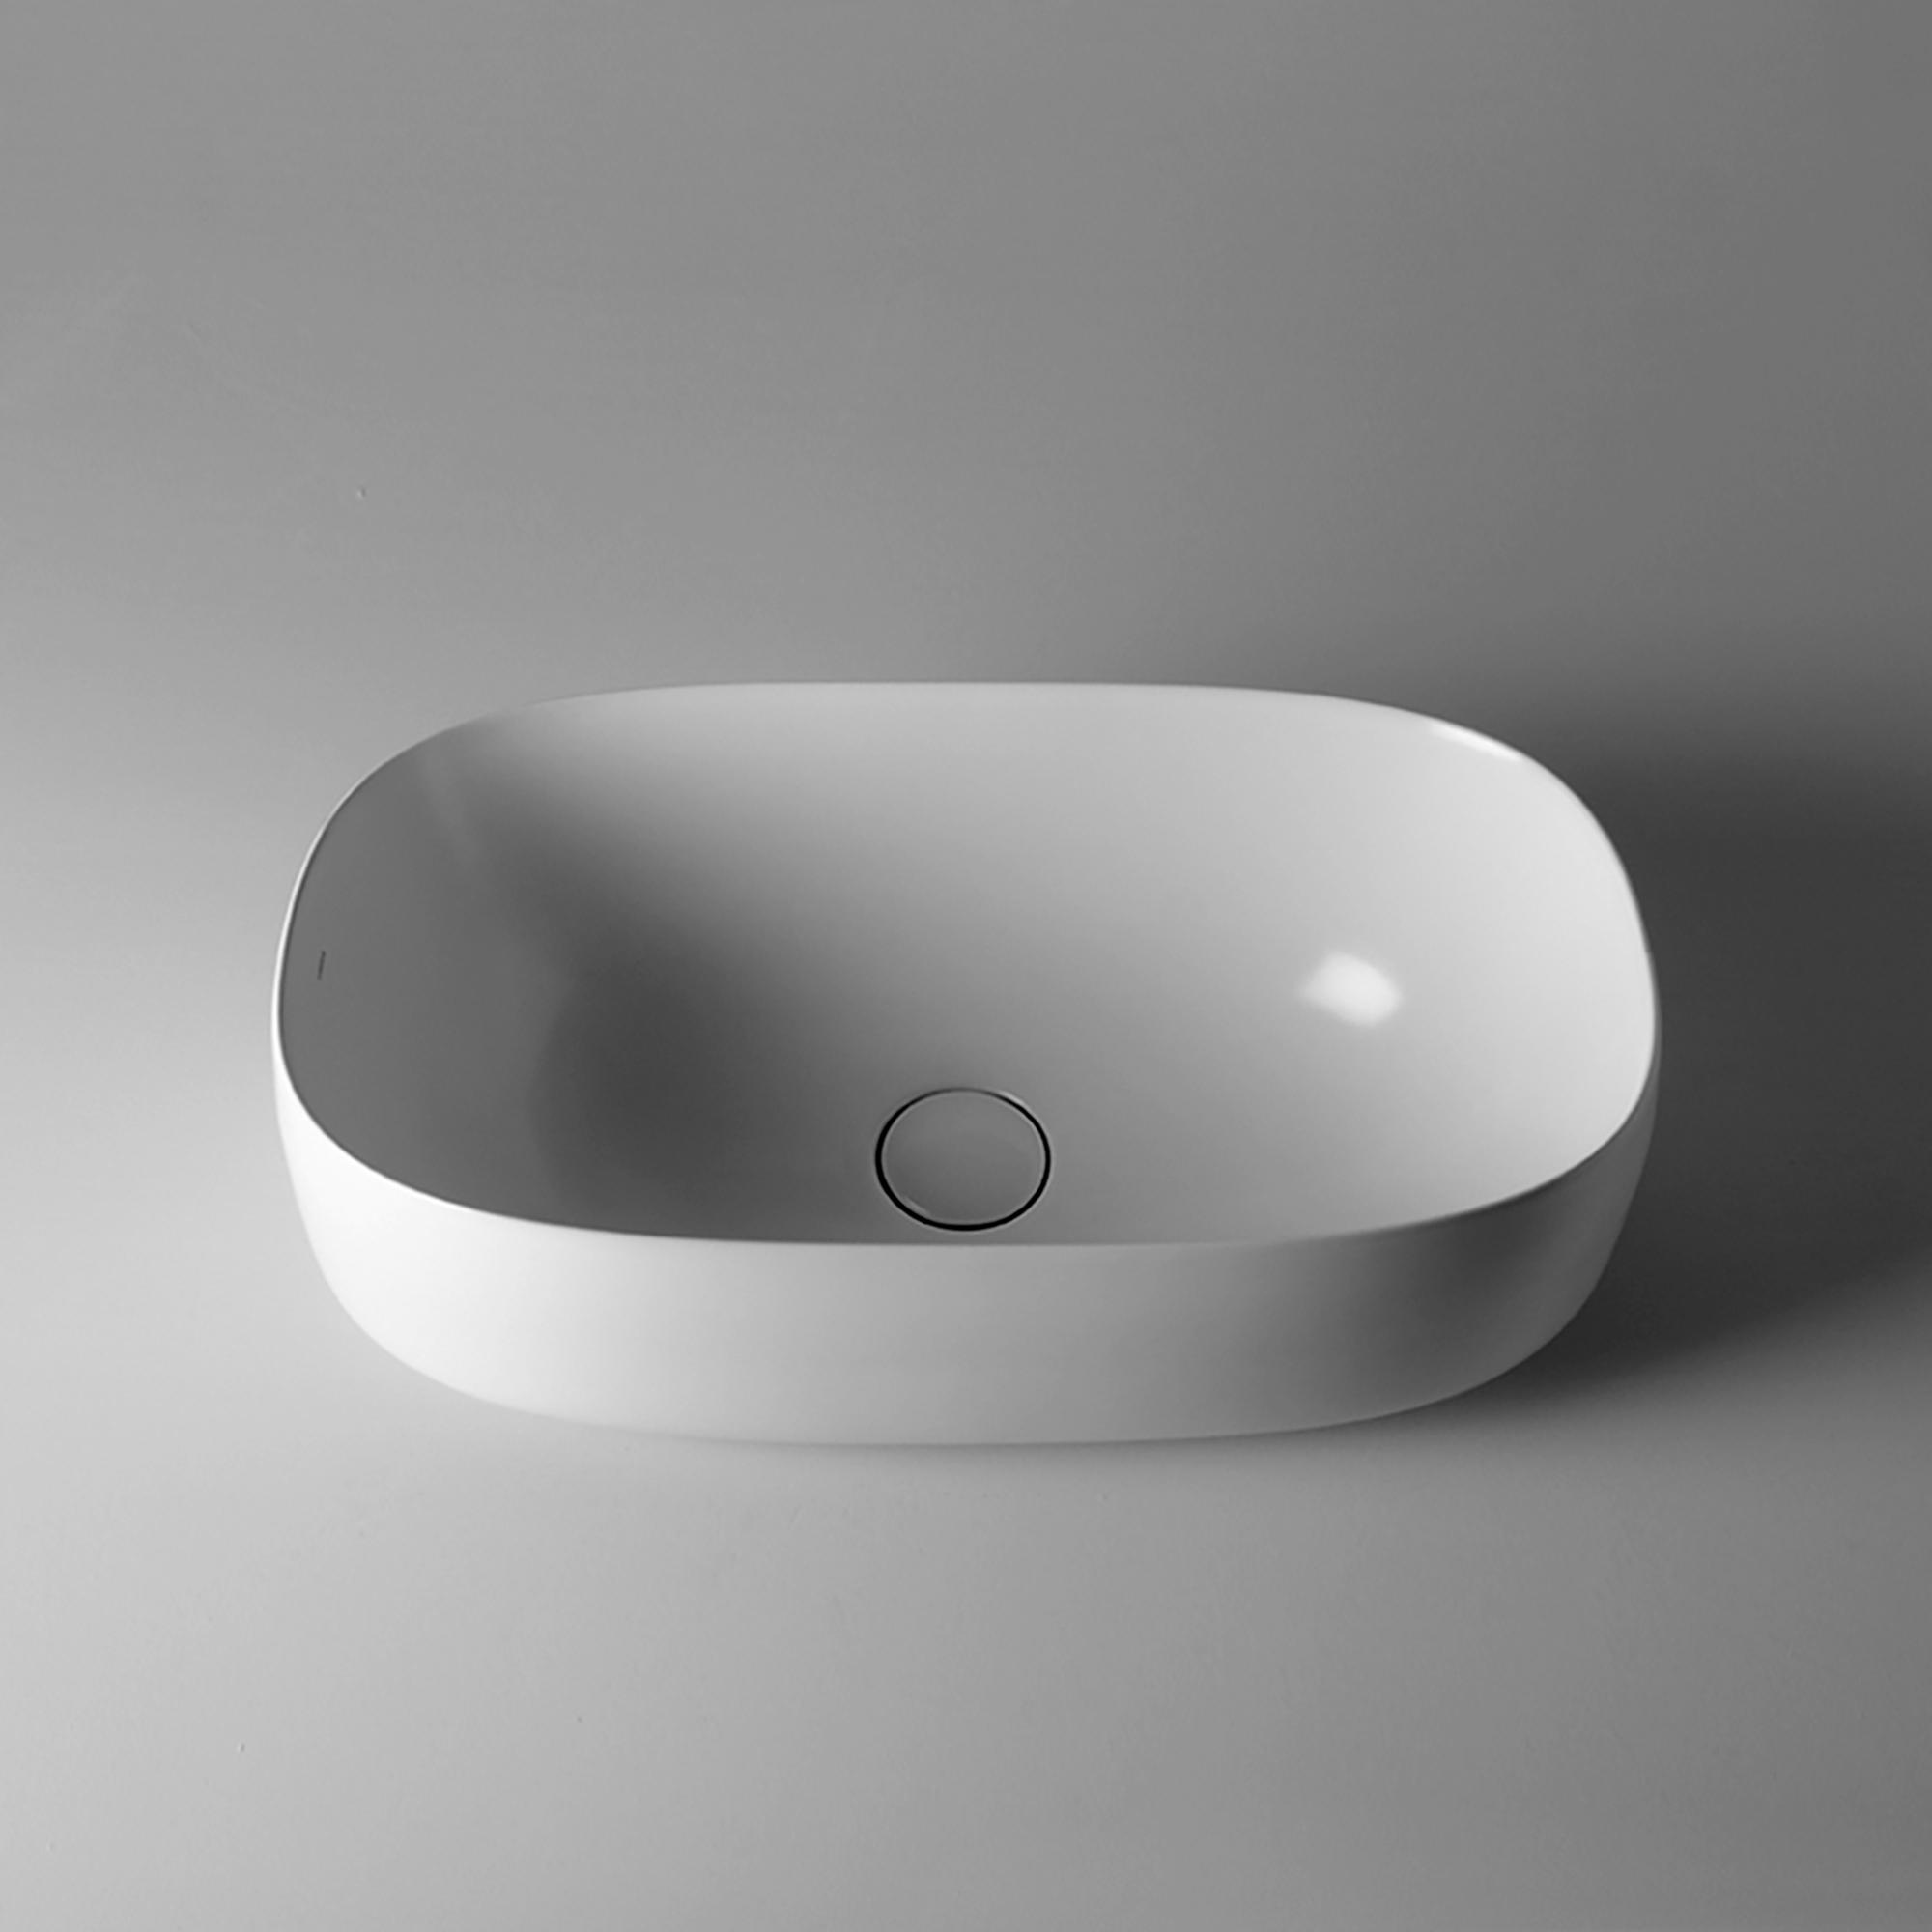 Seed 55.30 - SEL06 Bathroom Sink in Glossy White